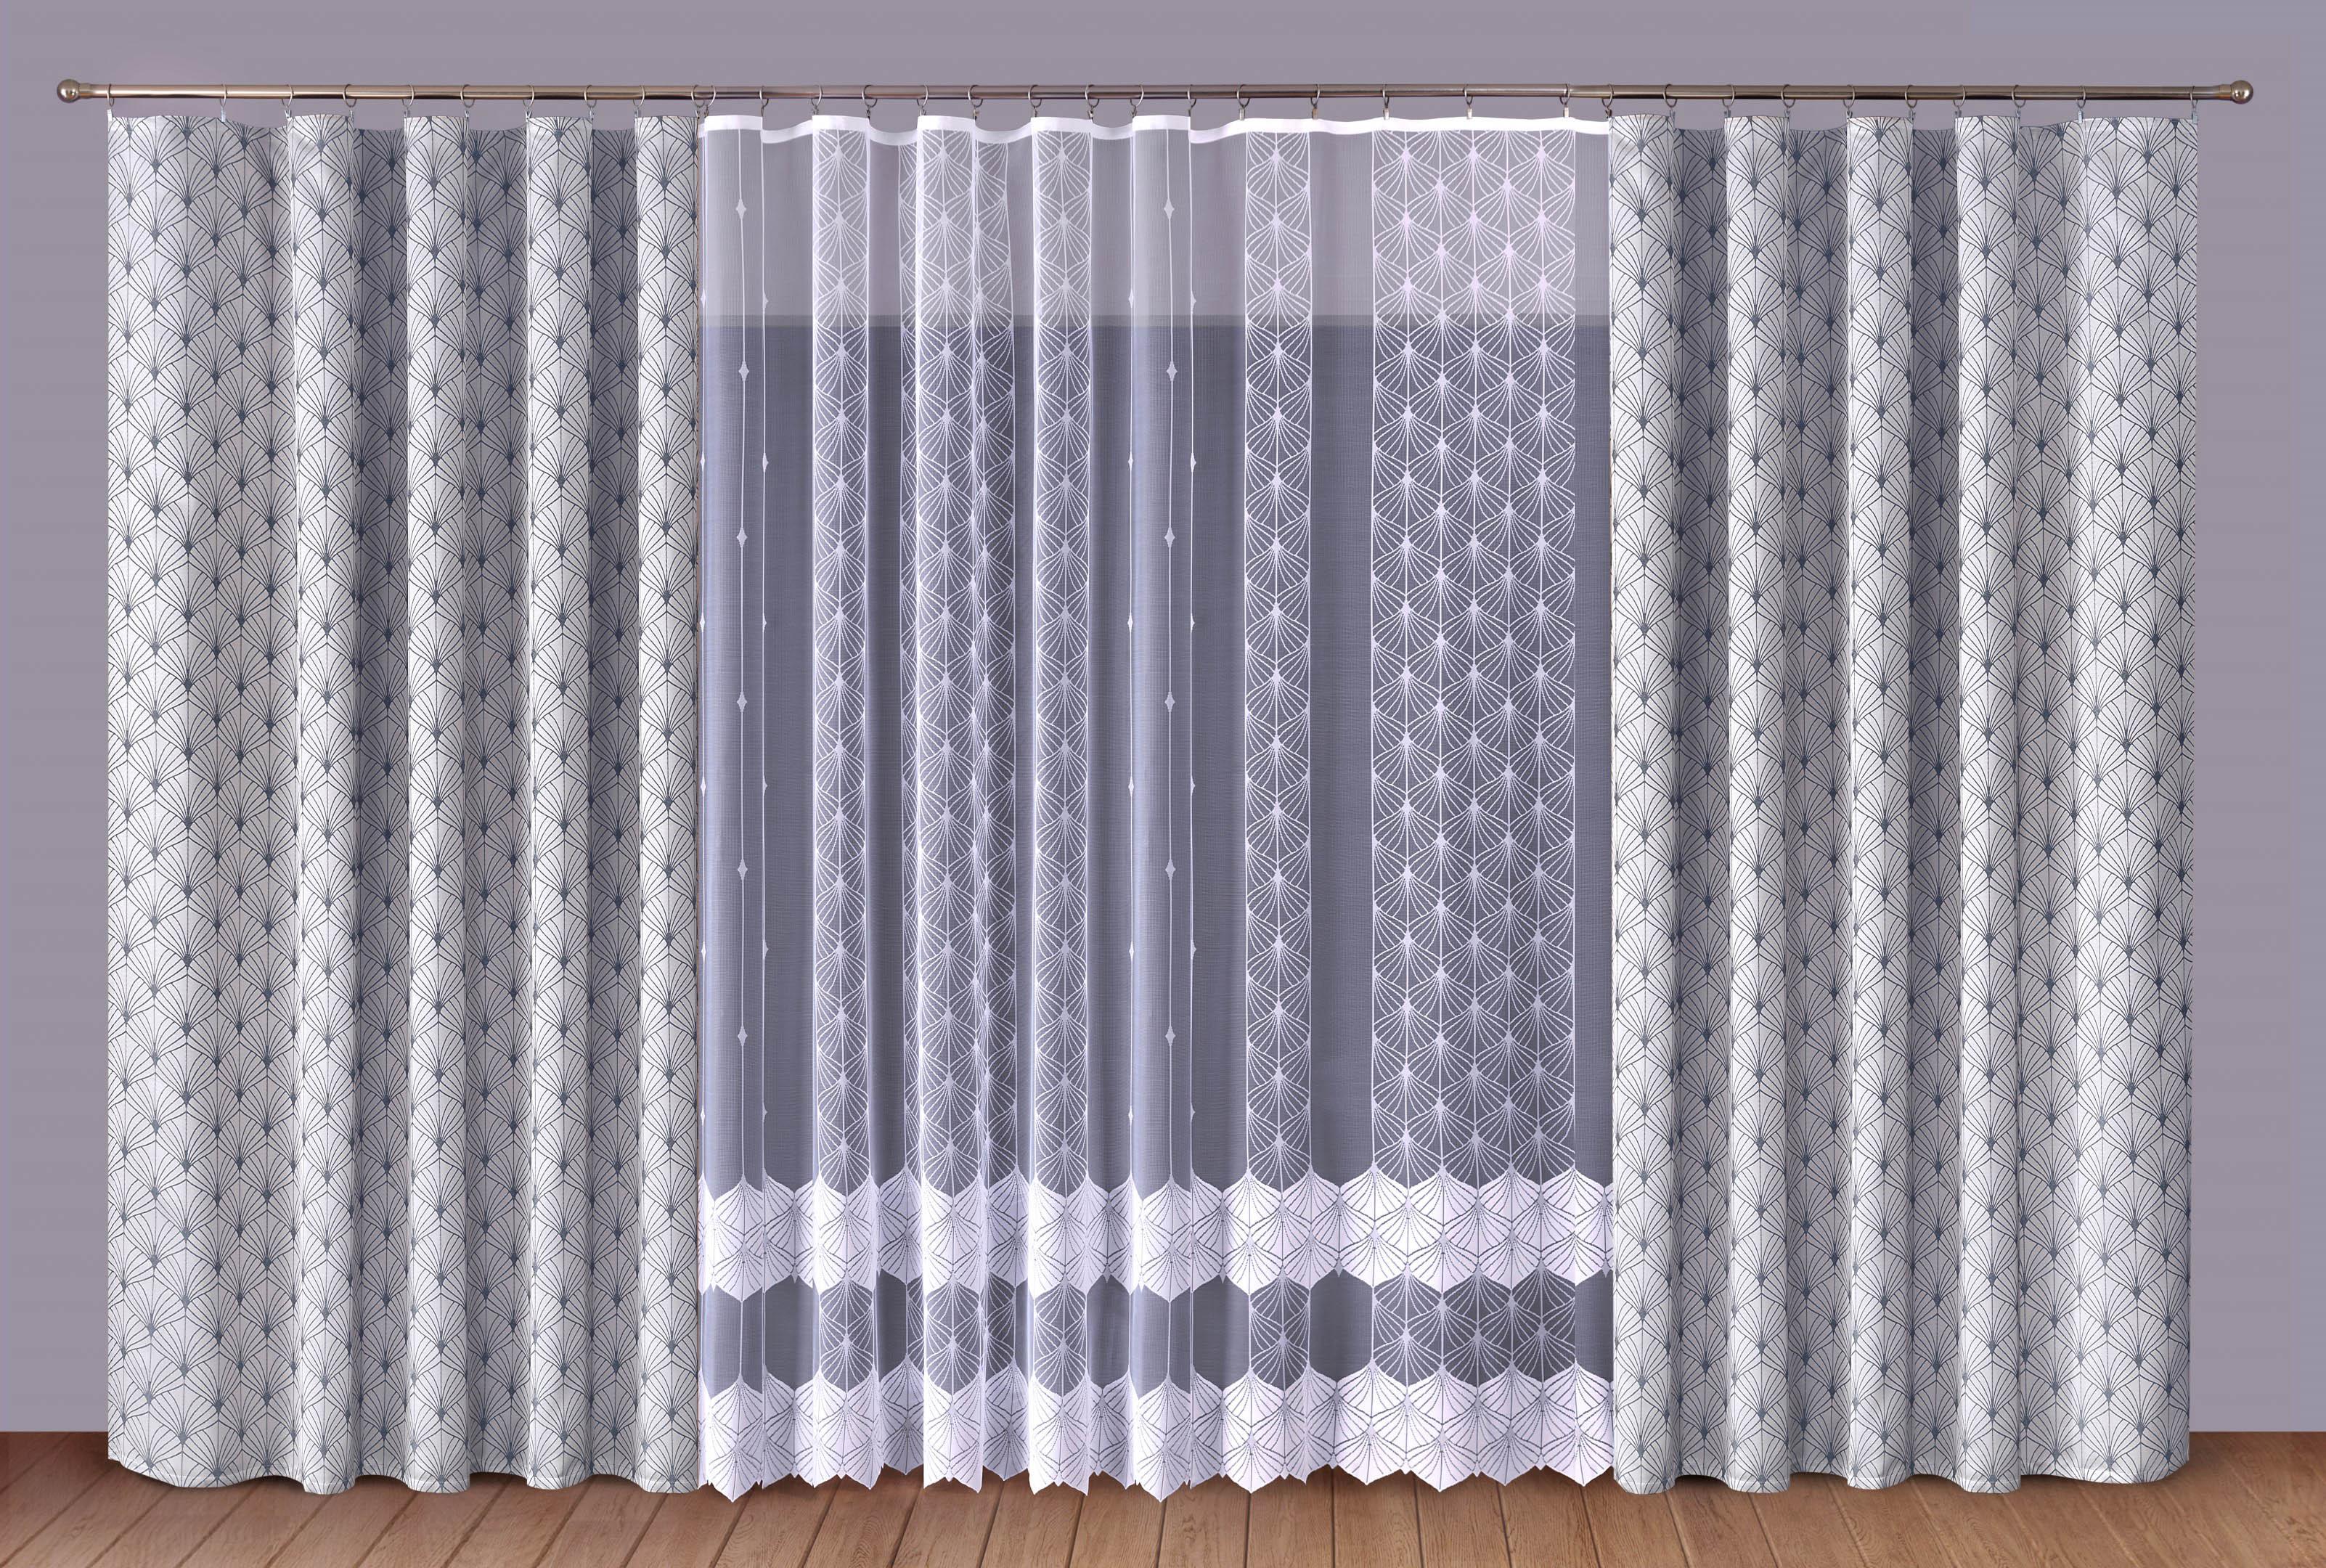 Шторы Primavera Классические шторы Albertine Цвет: Серый-Белый шторы primavera классические шторы maev цвет персиковый